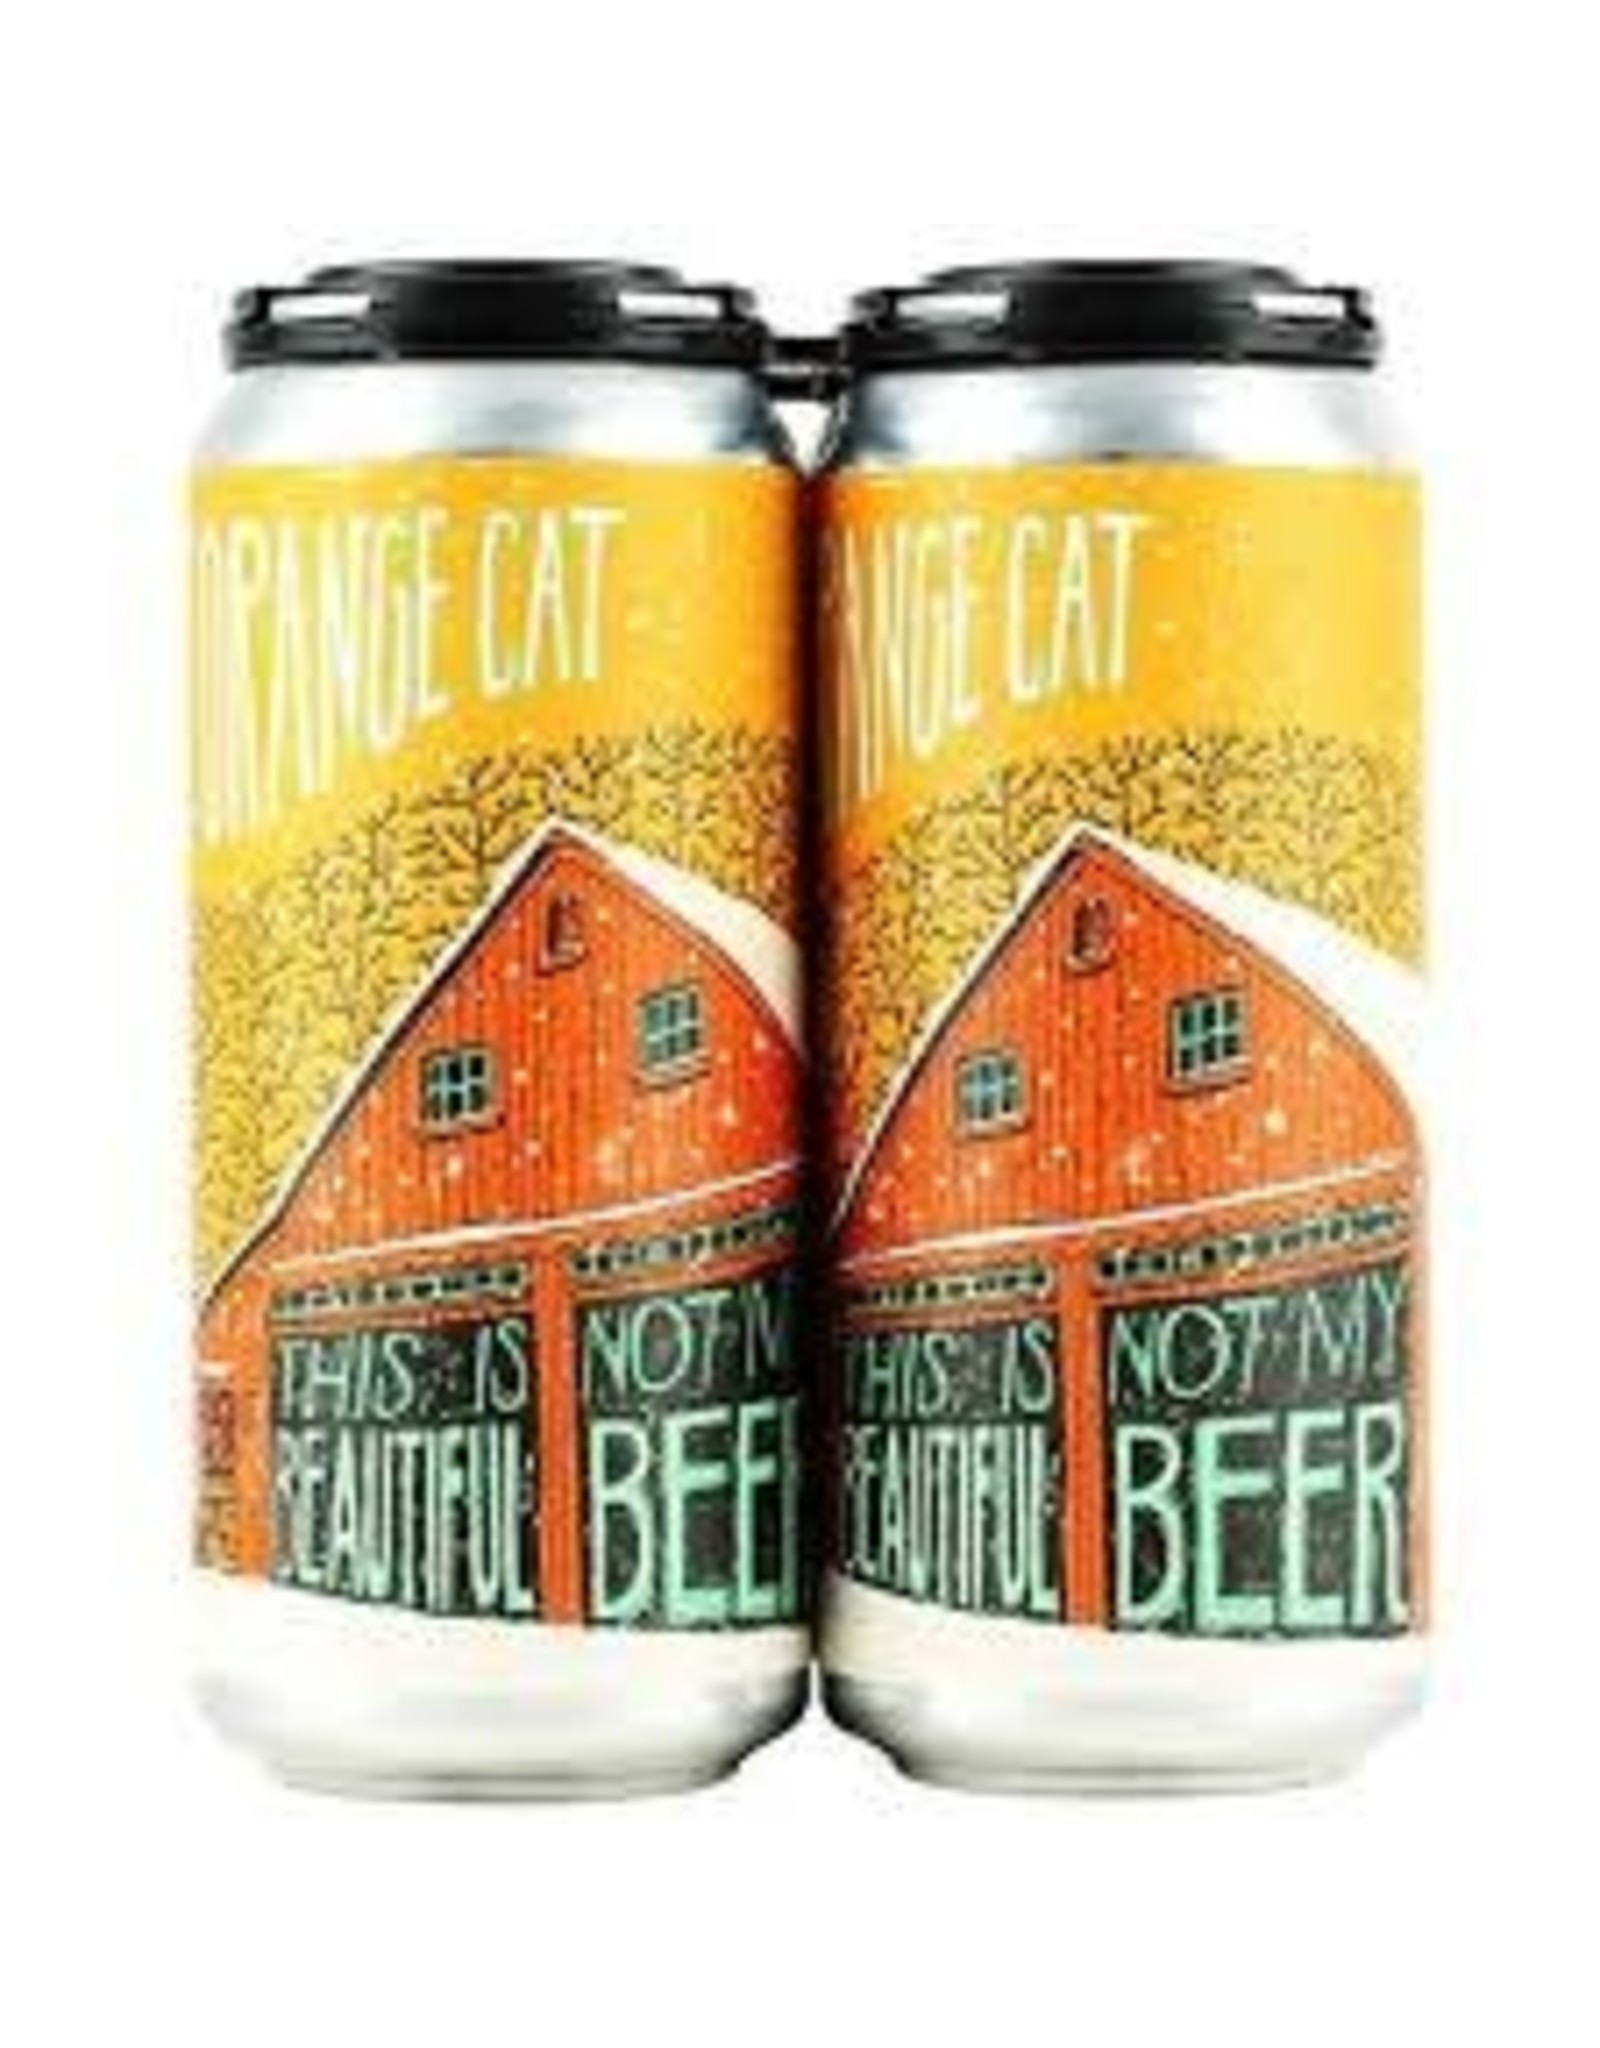 Fat Orange Cat Fat Orange Cat Not My Beautiful Beer 4pk can